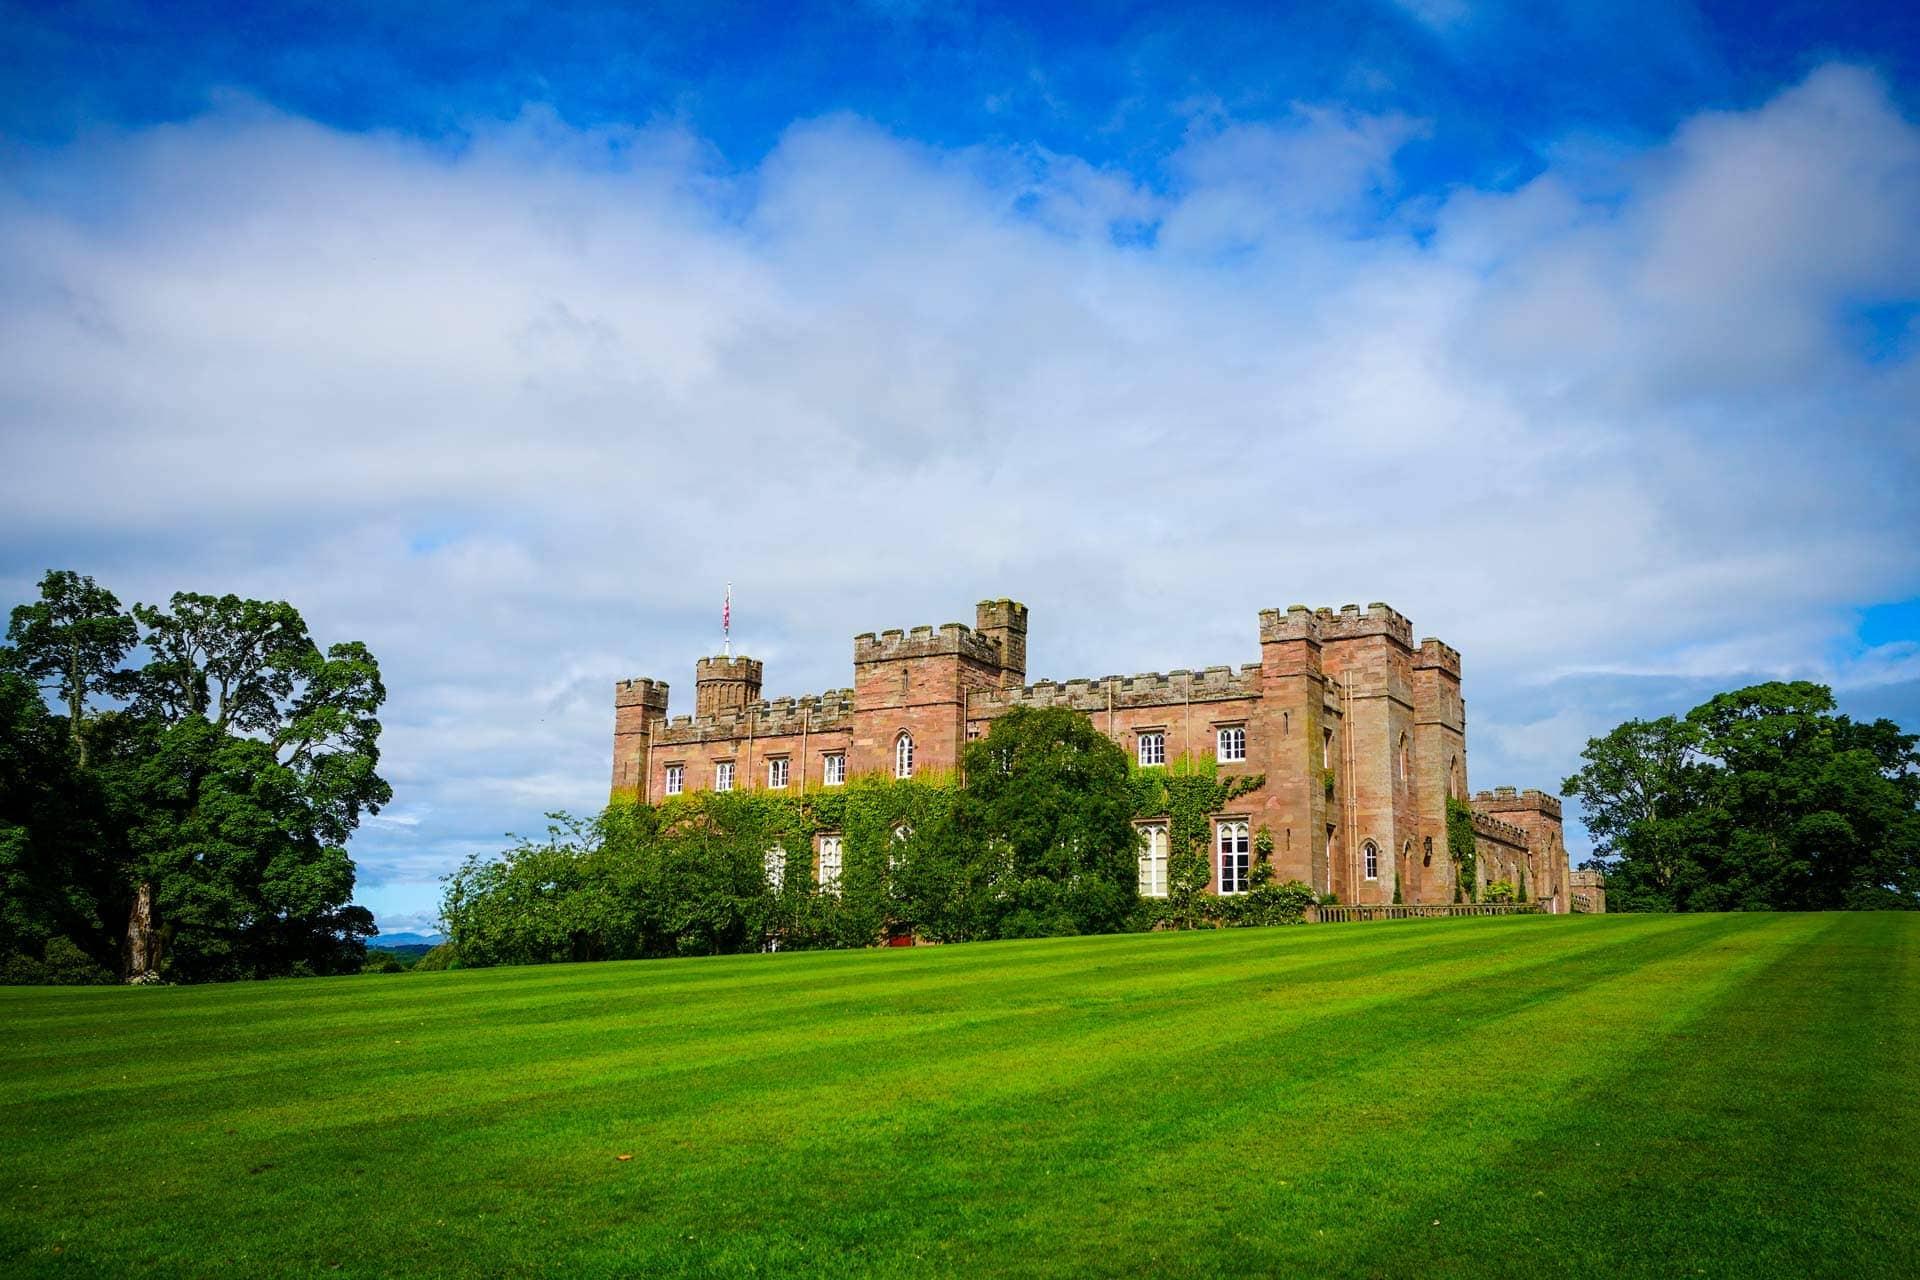 scone palace in perth scotland